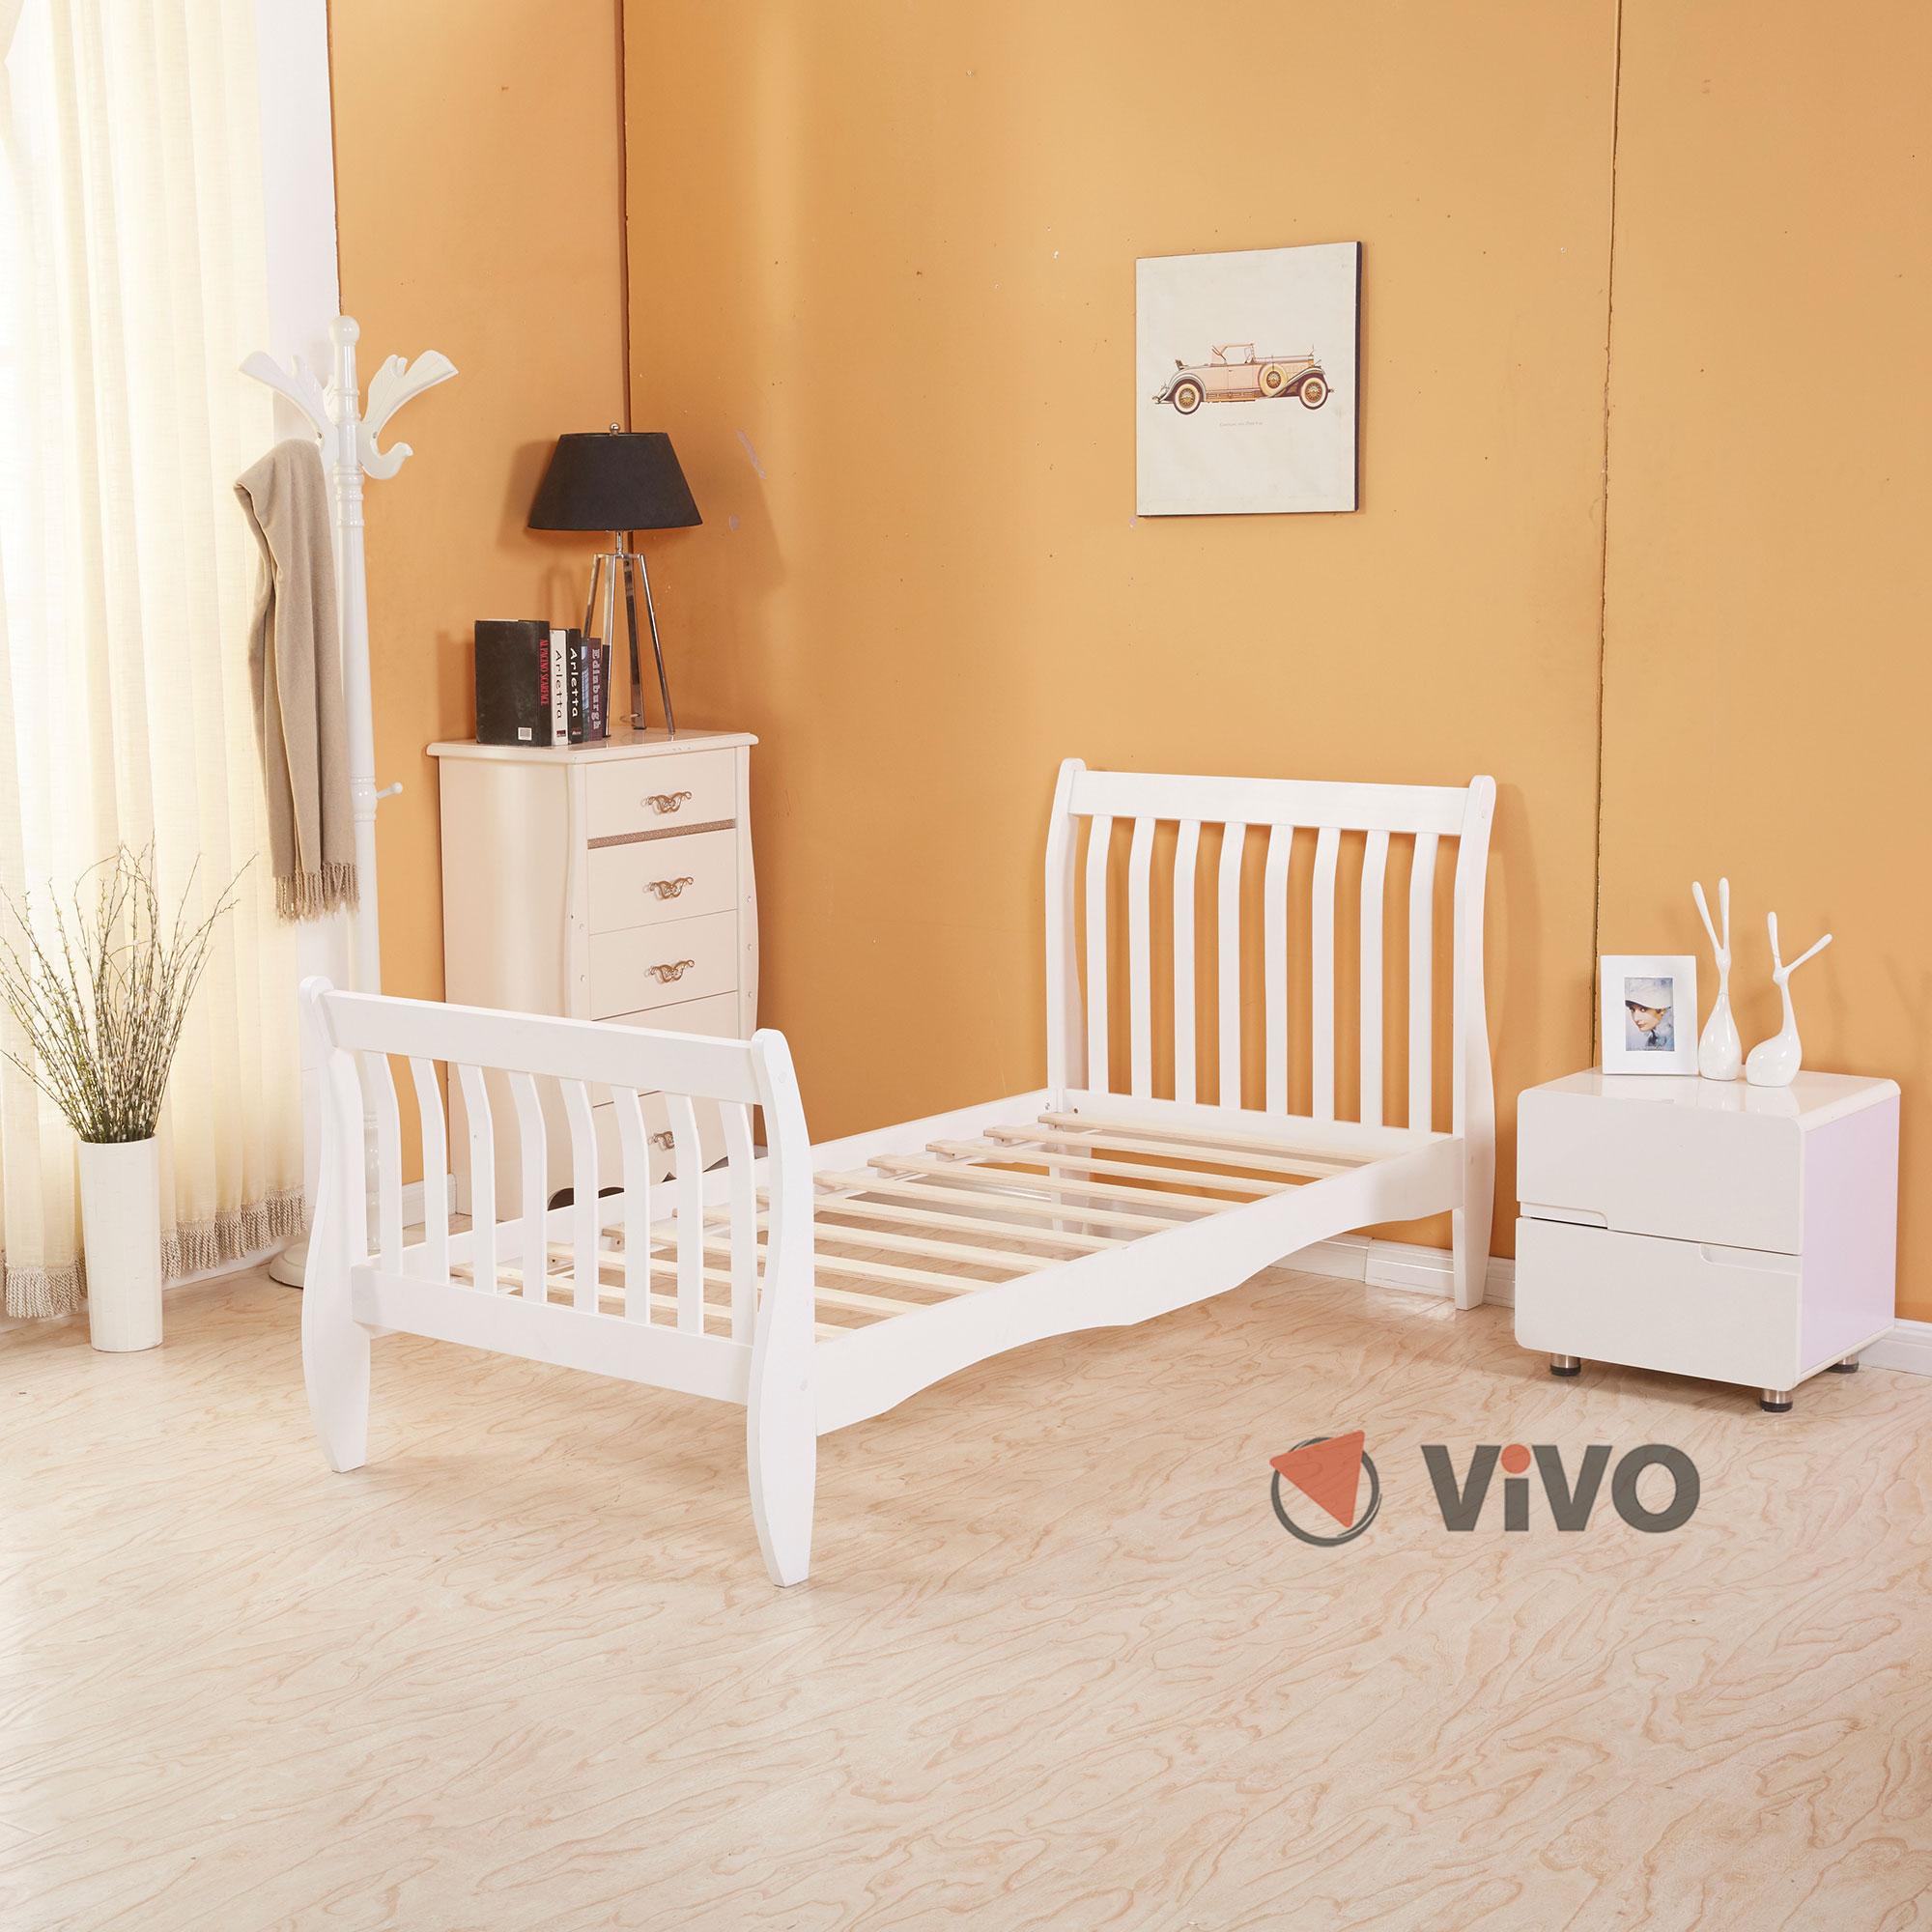 3ft Single Wooden Sleigh Bed Frame Pine Bedroom Furniture